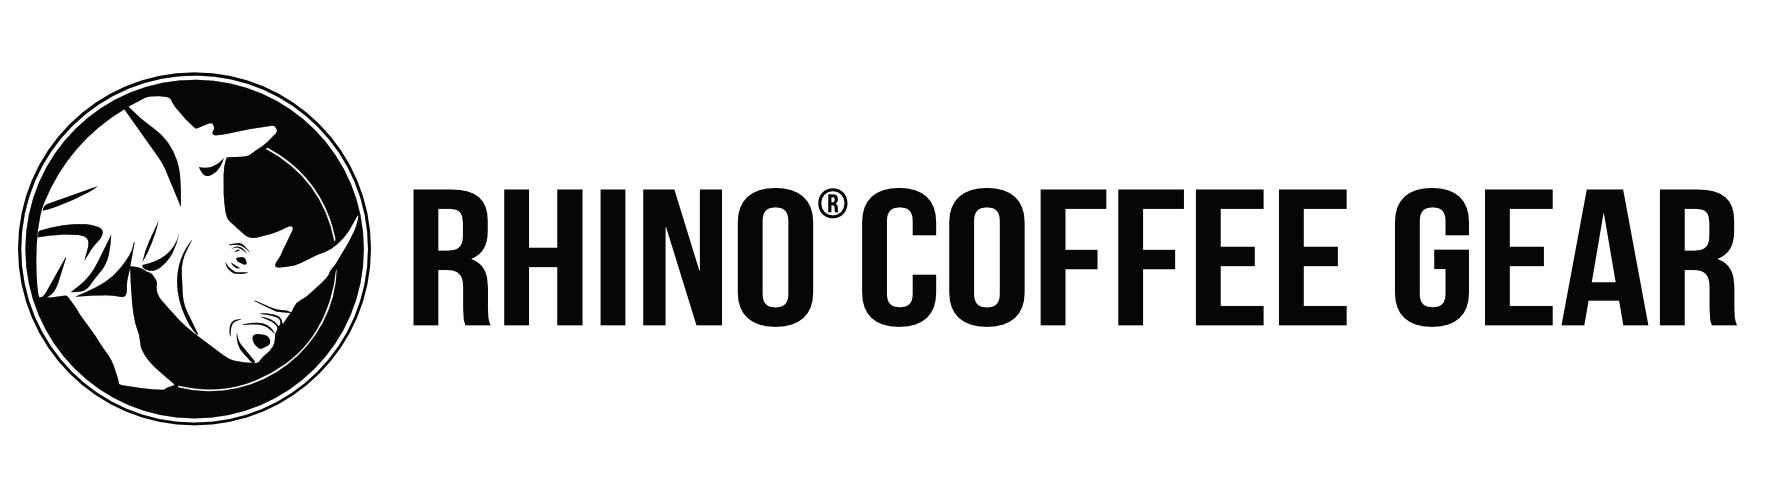 Rhino® Coffee Gear